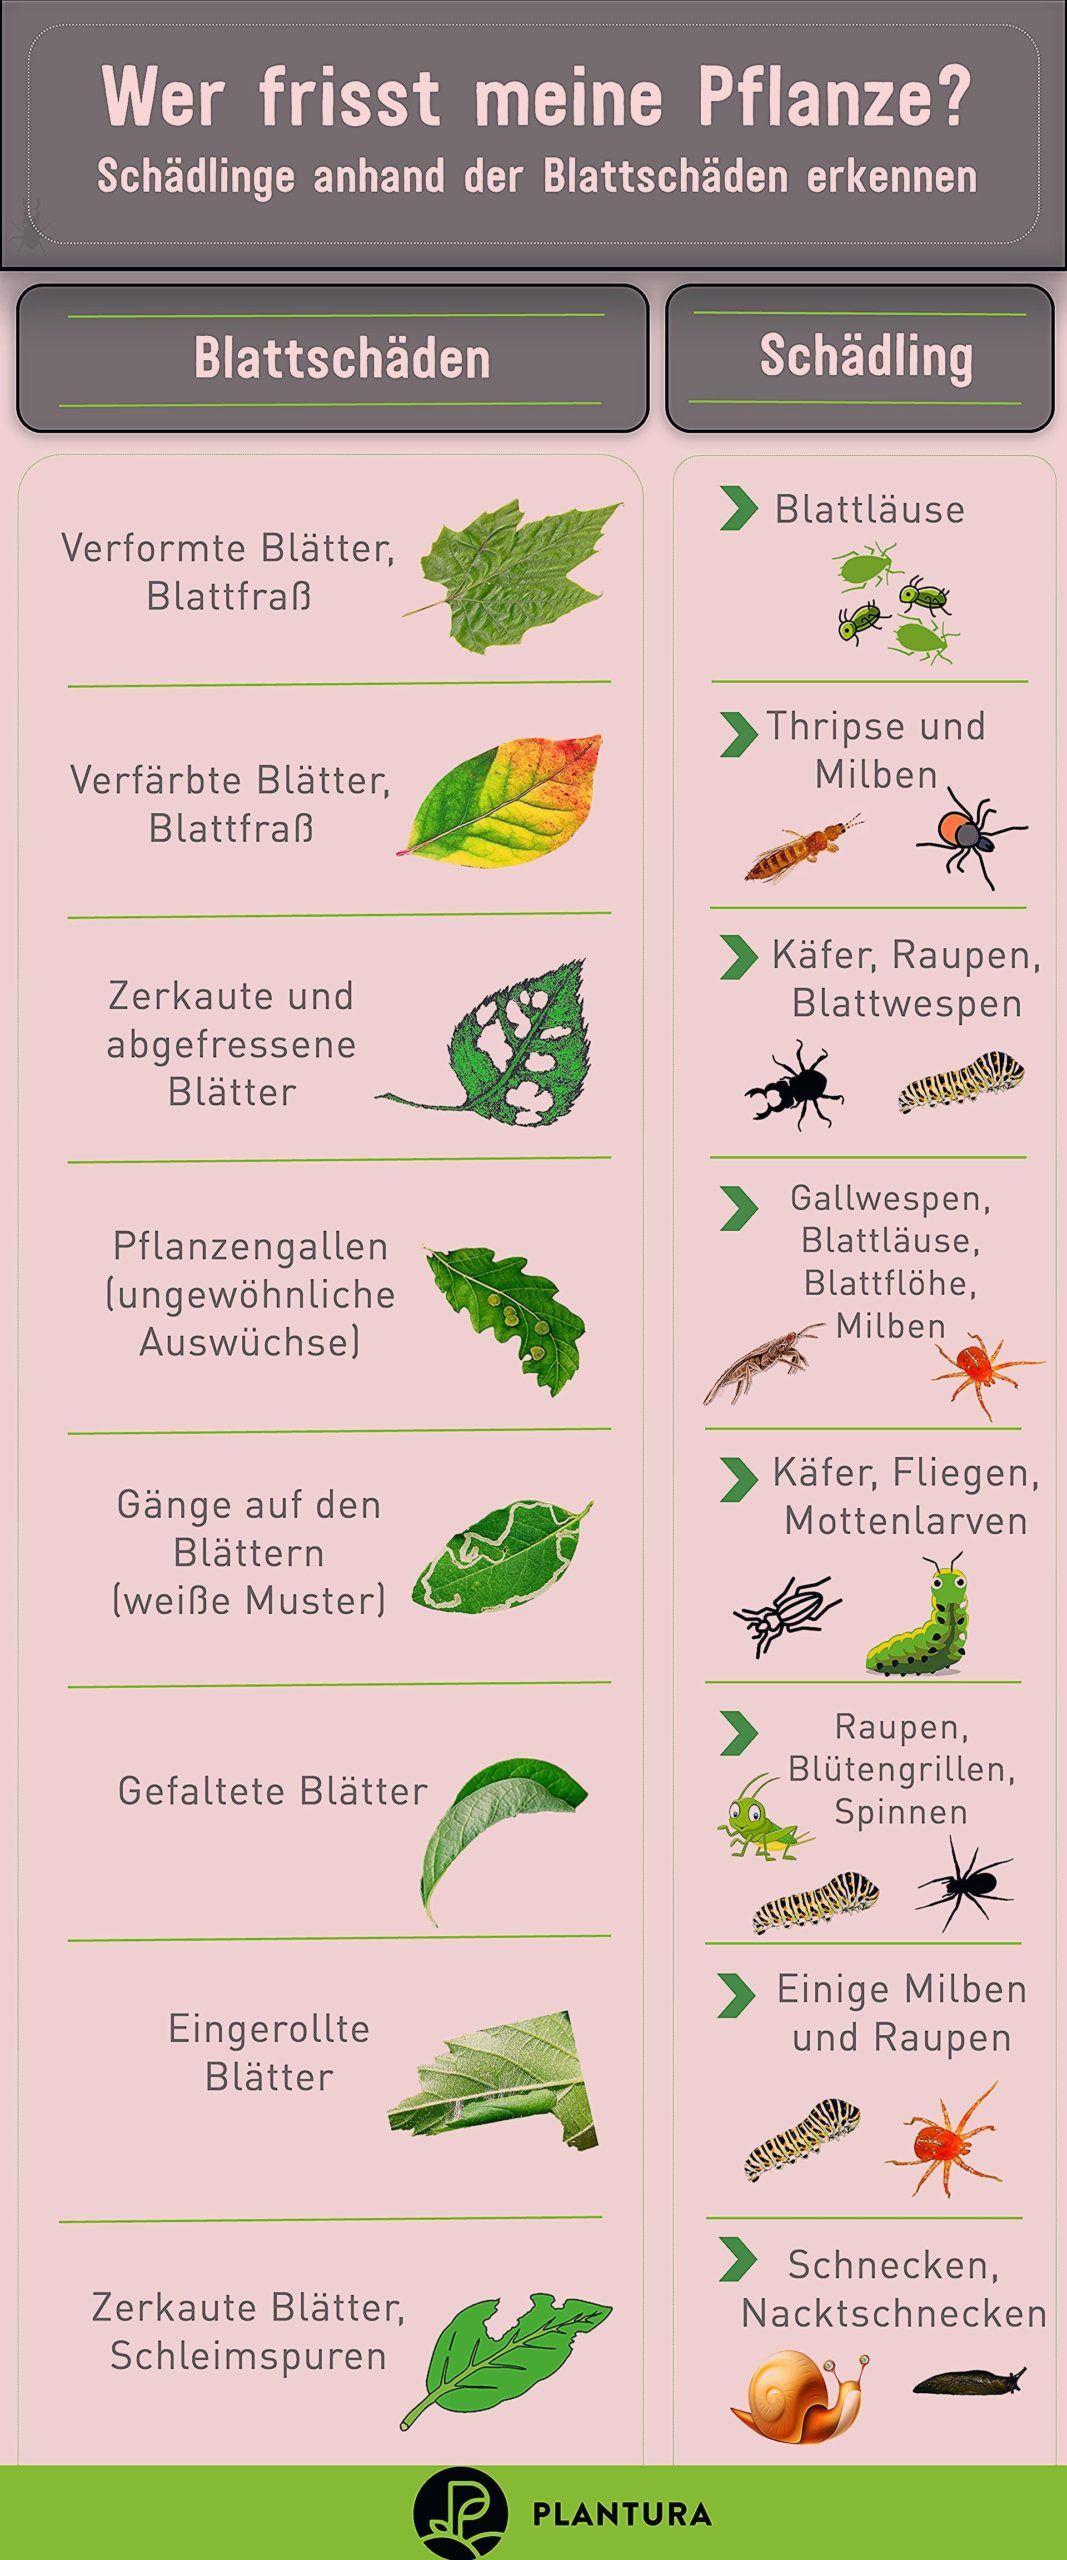 10 Hausmittel Gegen Schadlinge Im Garten Plantura Fruchte Im Garten In 2020 Schadlinge Im Garten Pflanzen Gartenschadlinge